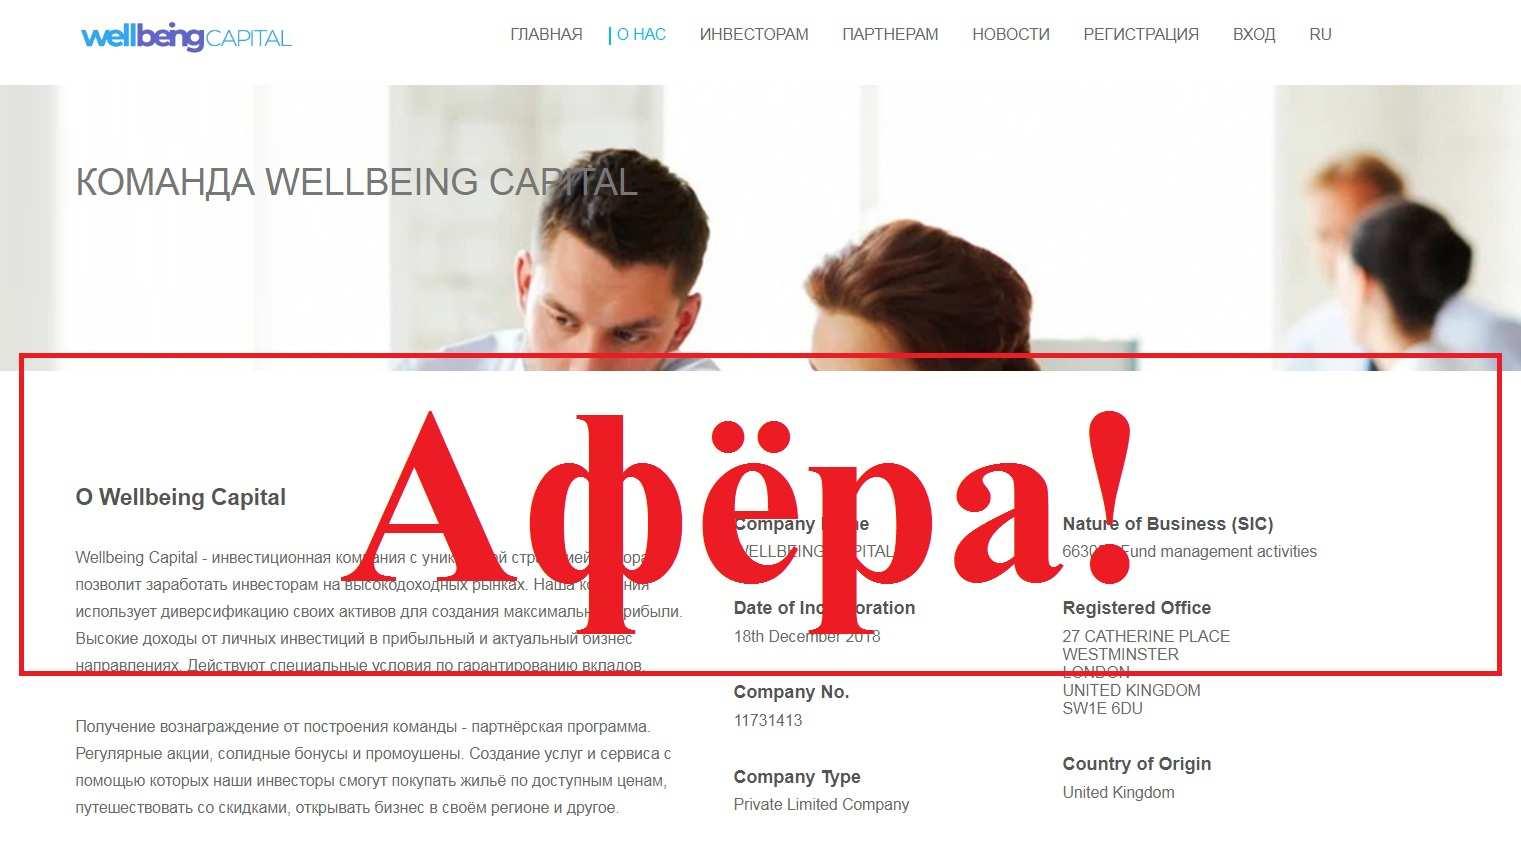 Wellbeing Capital – отзывы и анализ проекта